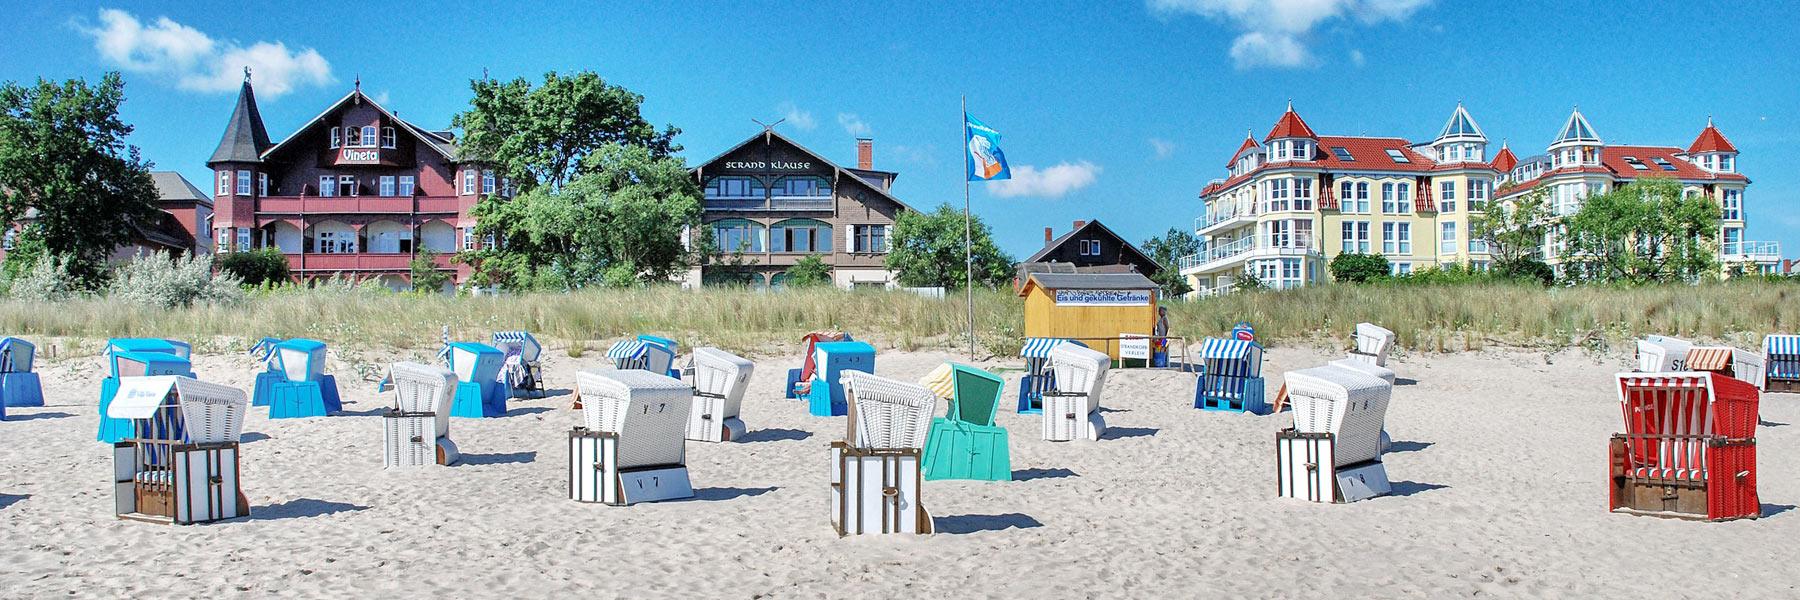 Strandkörbe - Seeheilbad Bansin